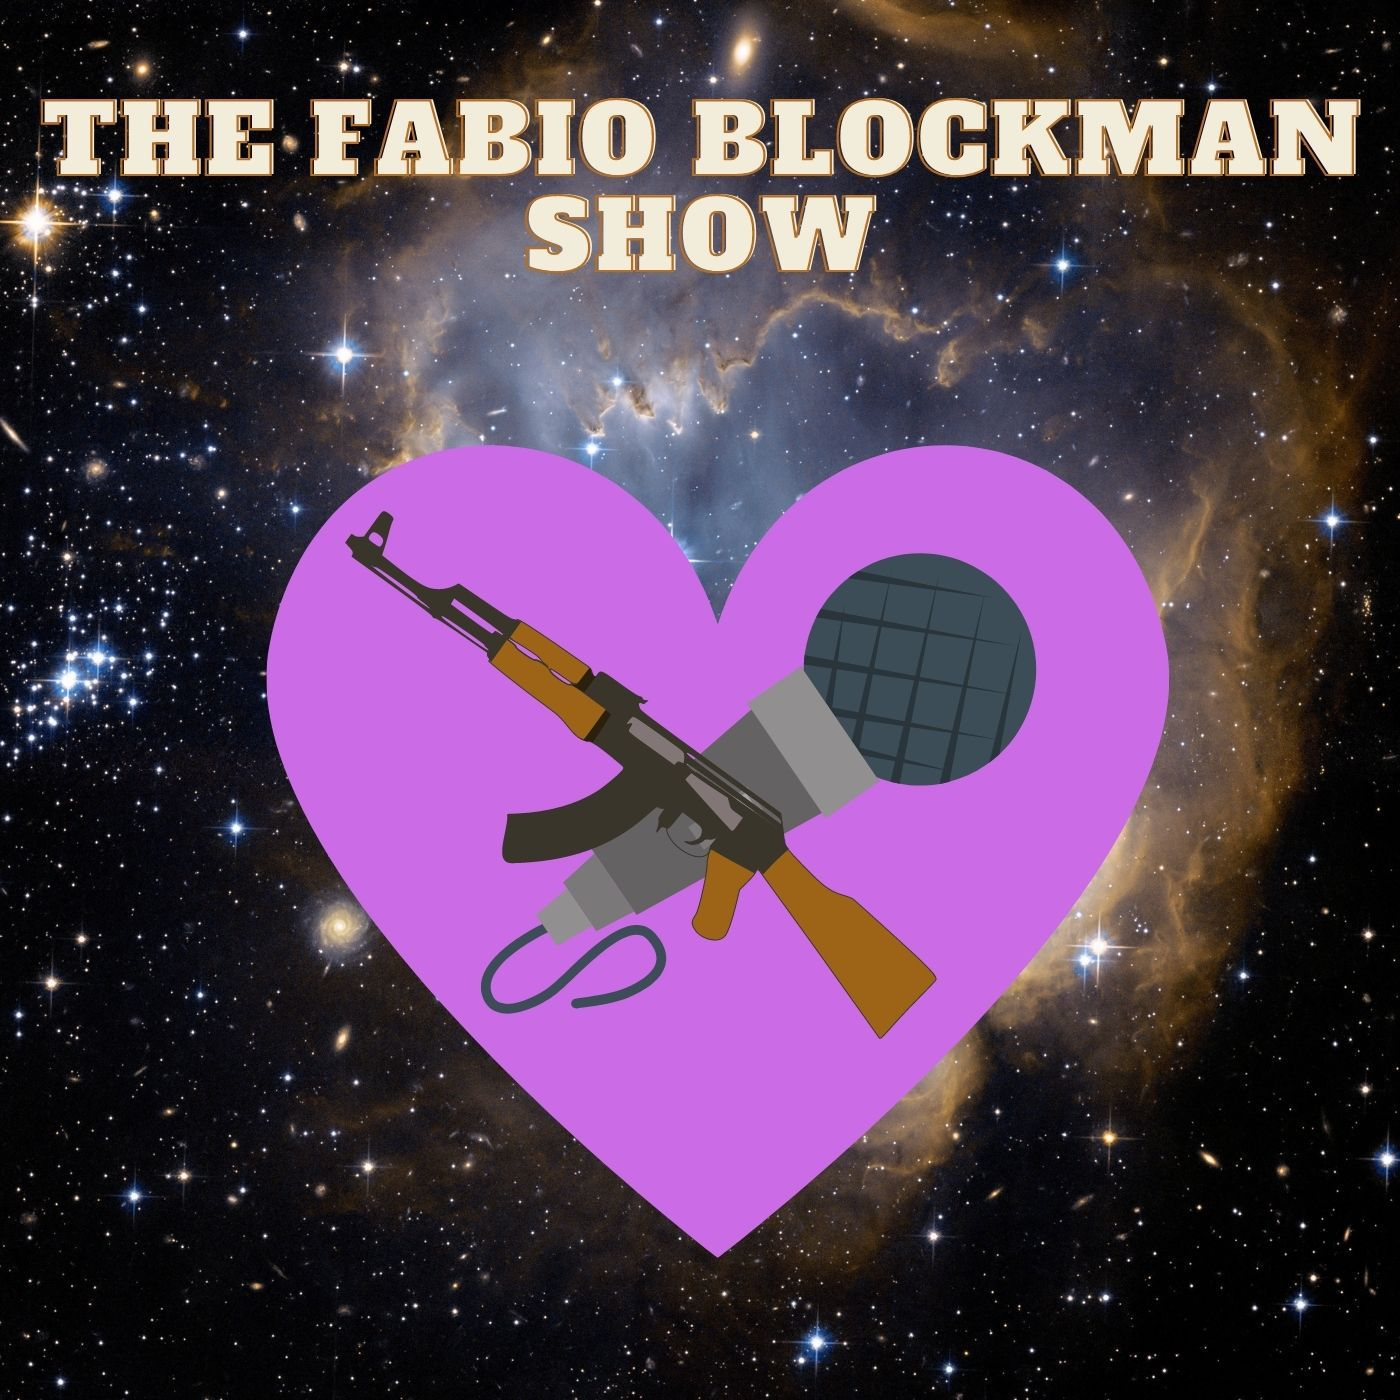 The Fabio Blockman Show